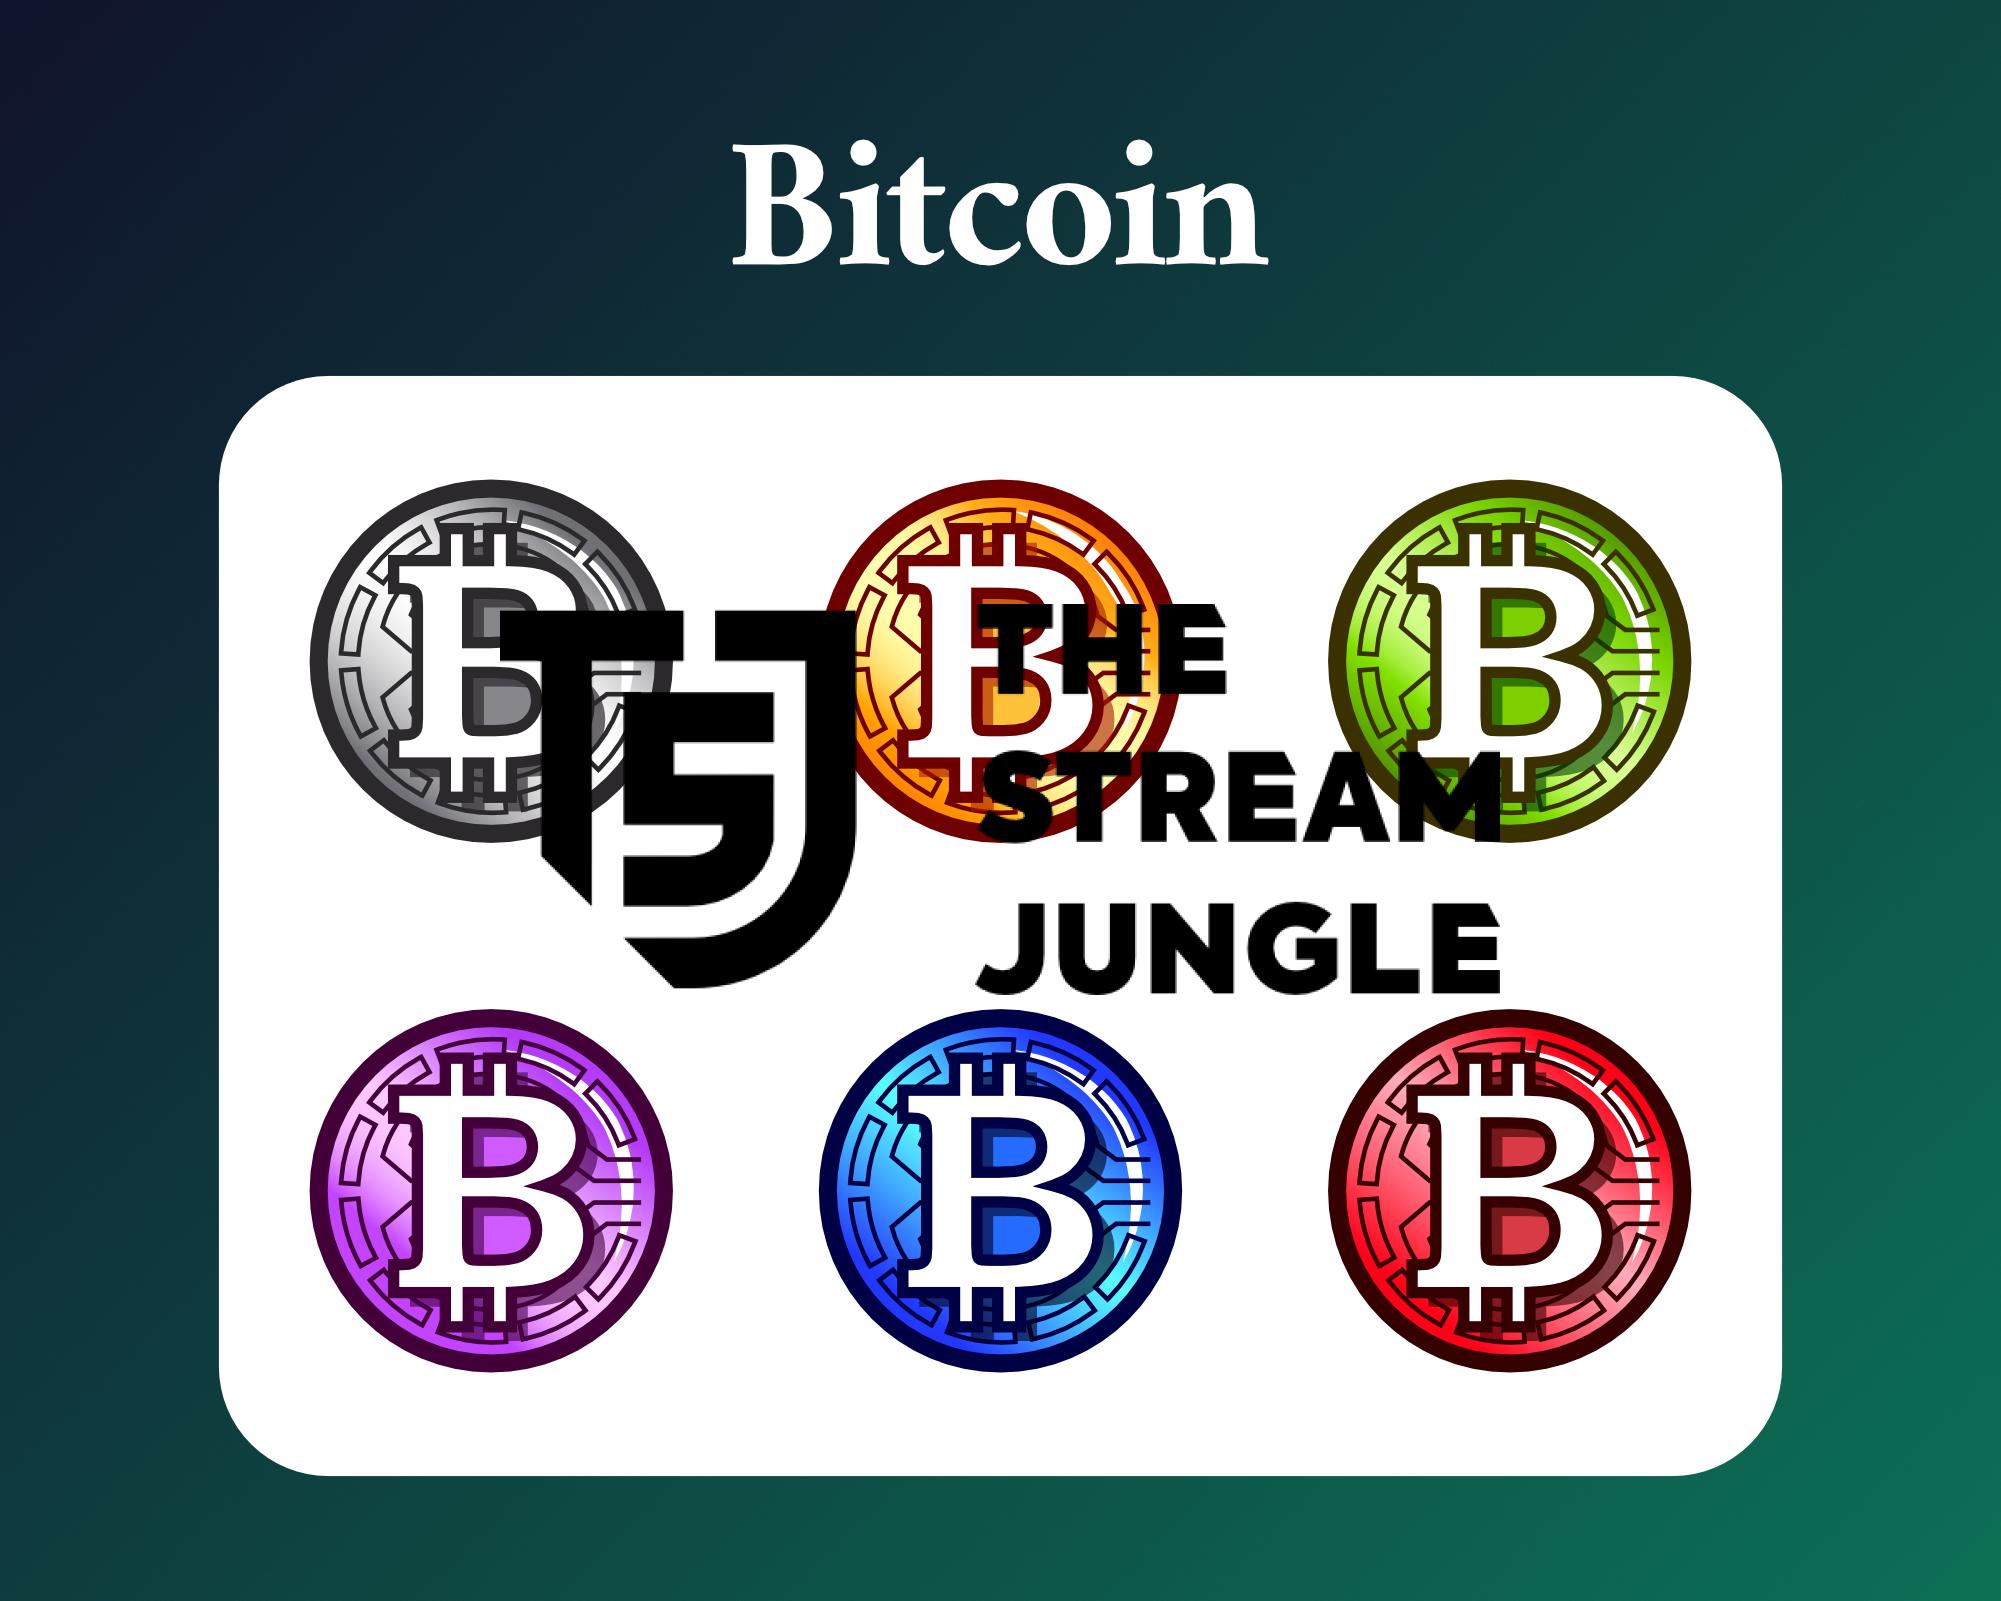 Bitcoin twitch sub badges